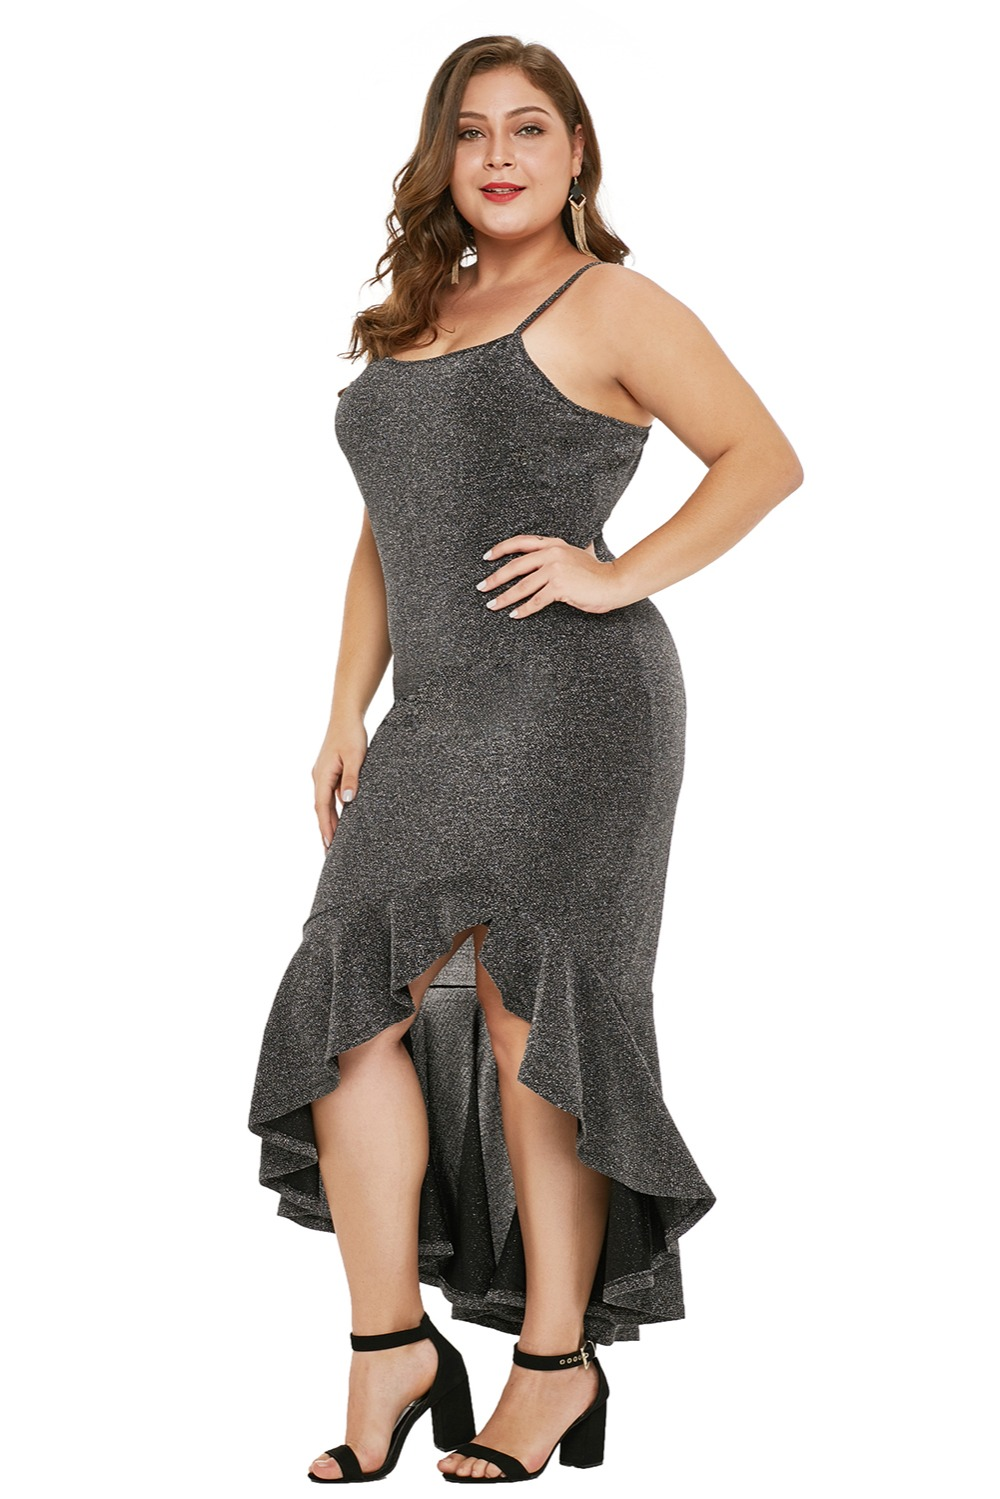 Charcoal-True-Shine-Plus-Size-High-low-Dress-LC610939-13-4